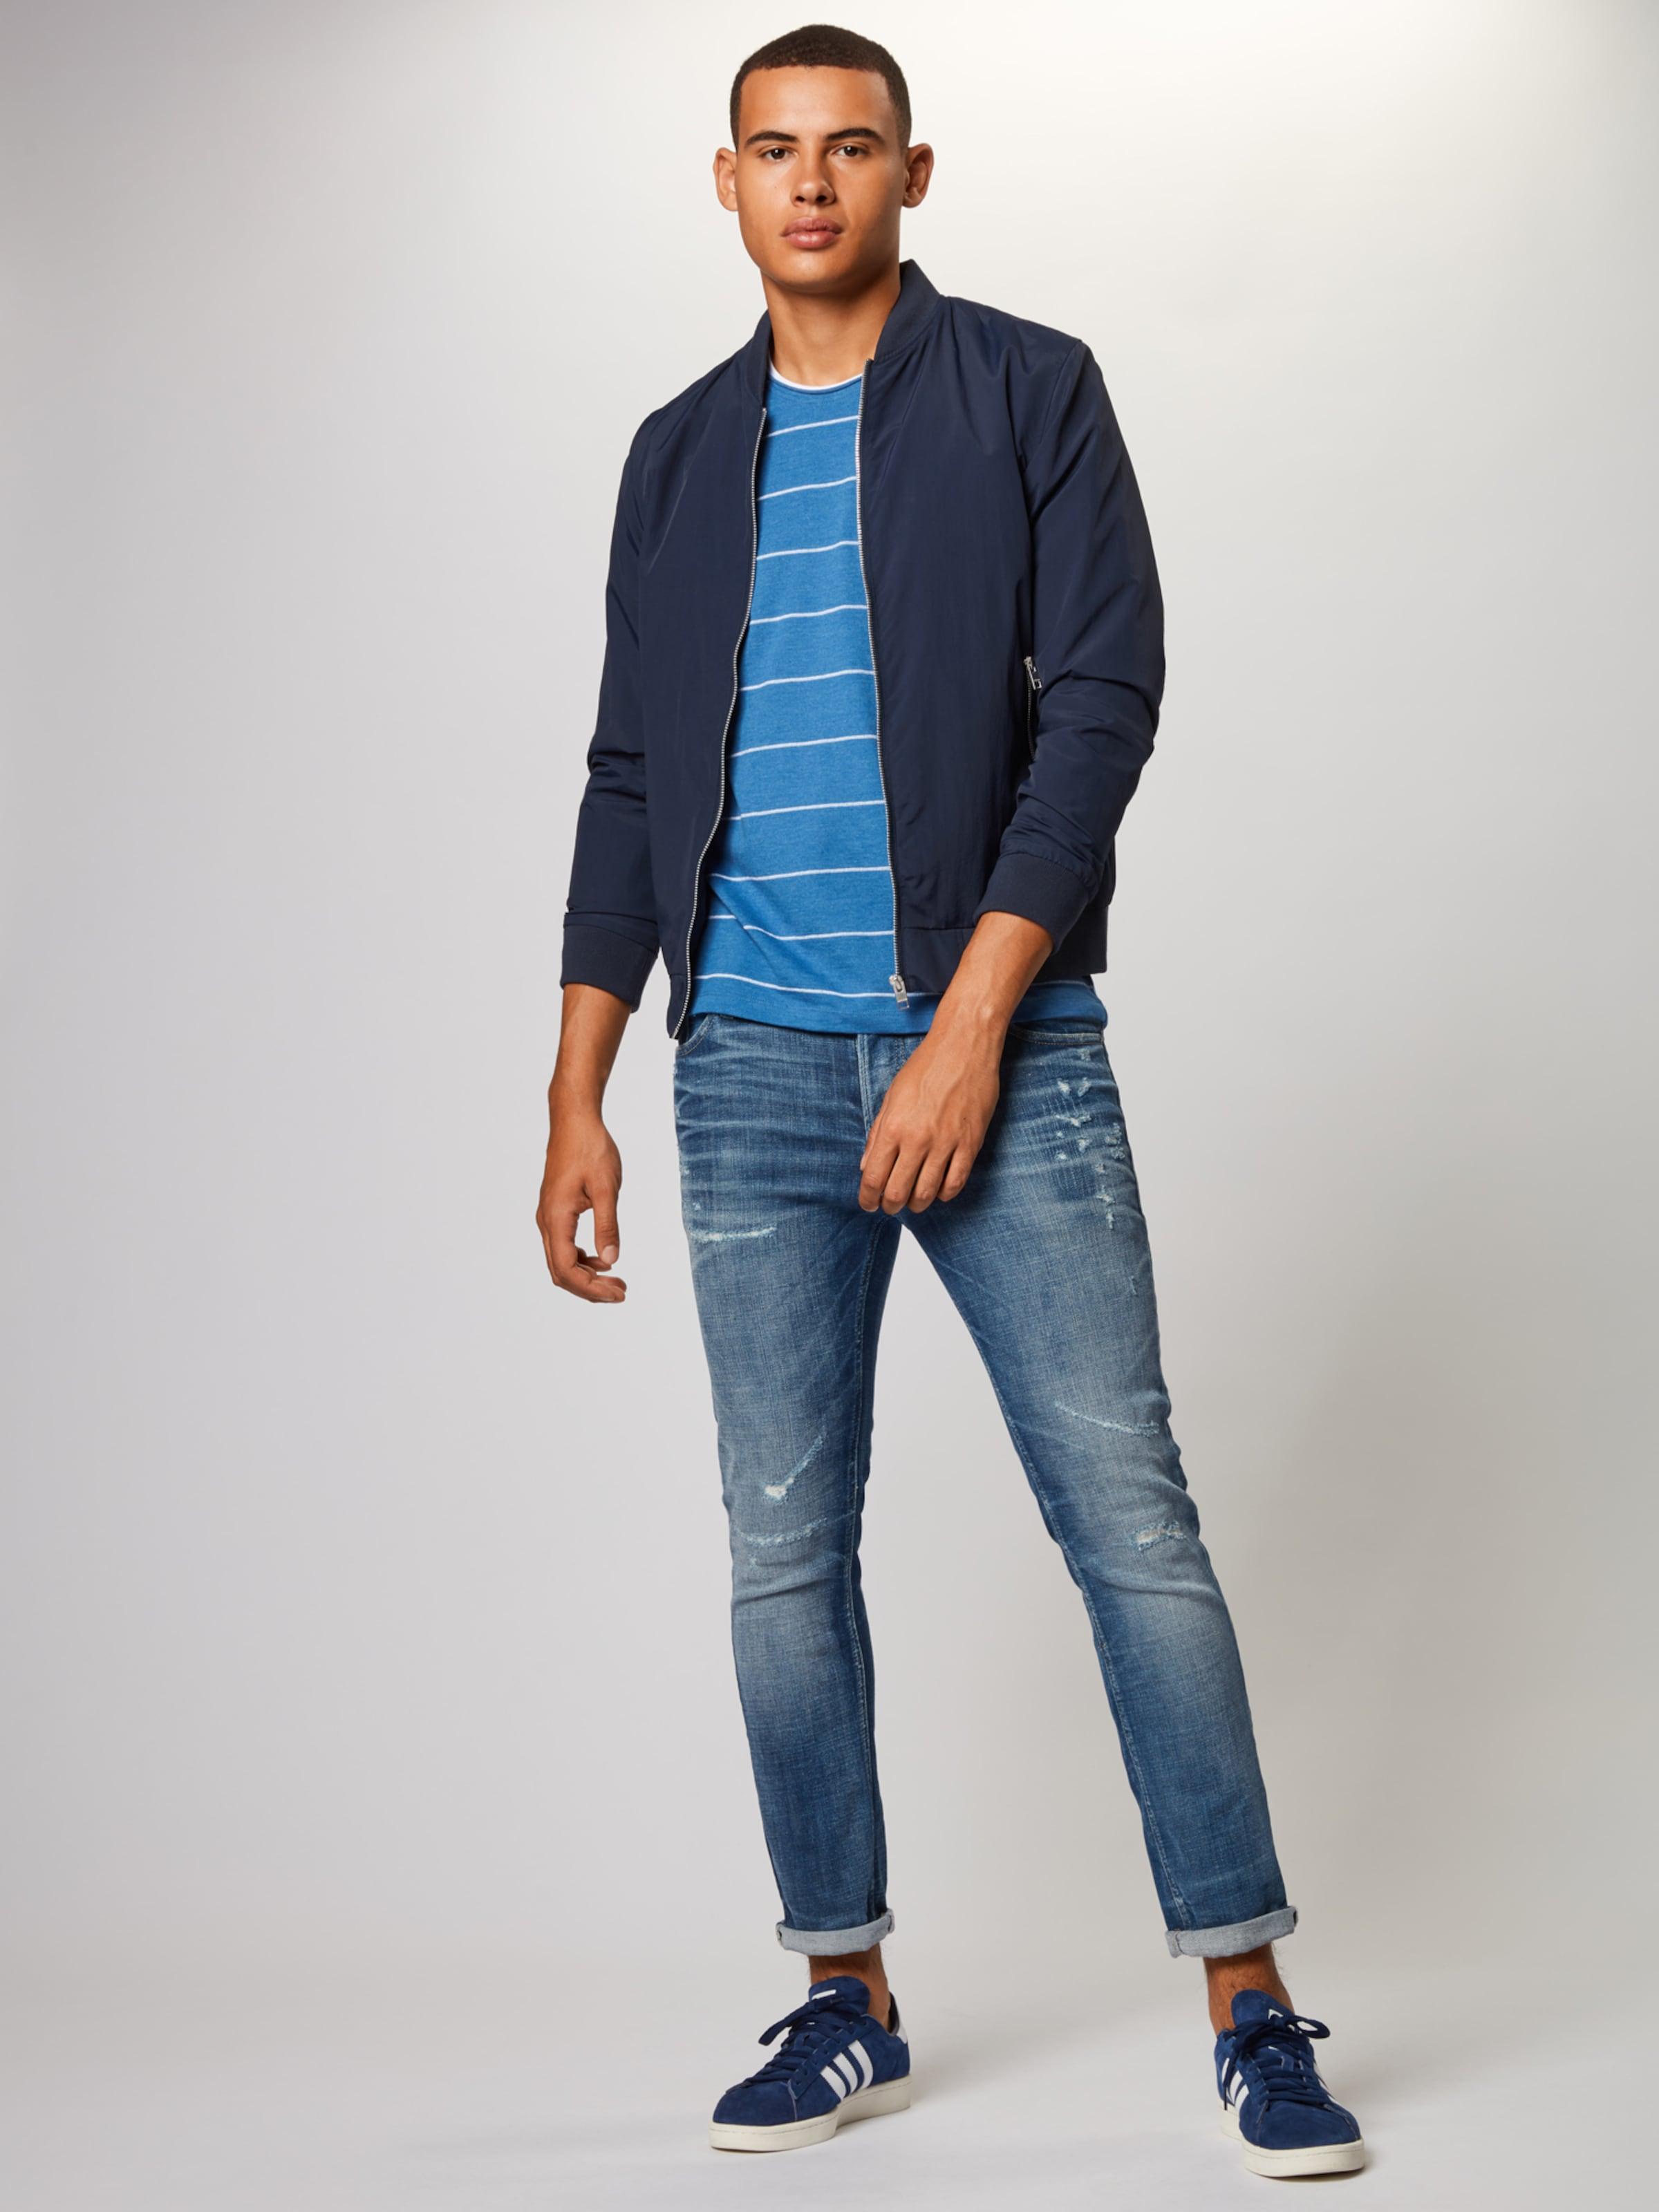 Edc 'sg En T BleuBlanc 069cc2k003' By Esprit shirt b76mgyIYfv